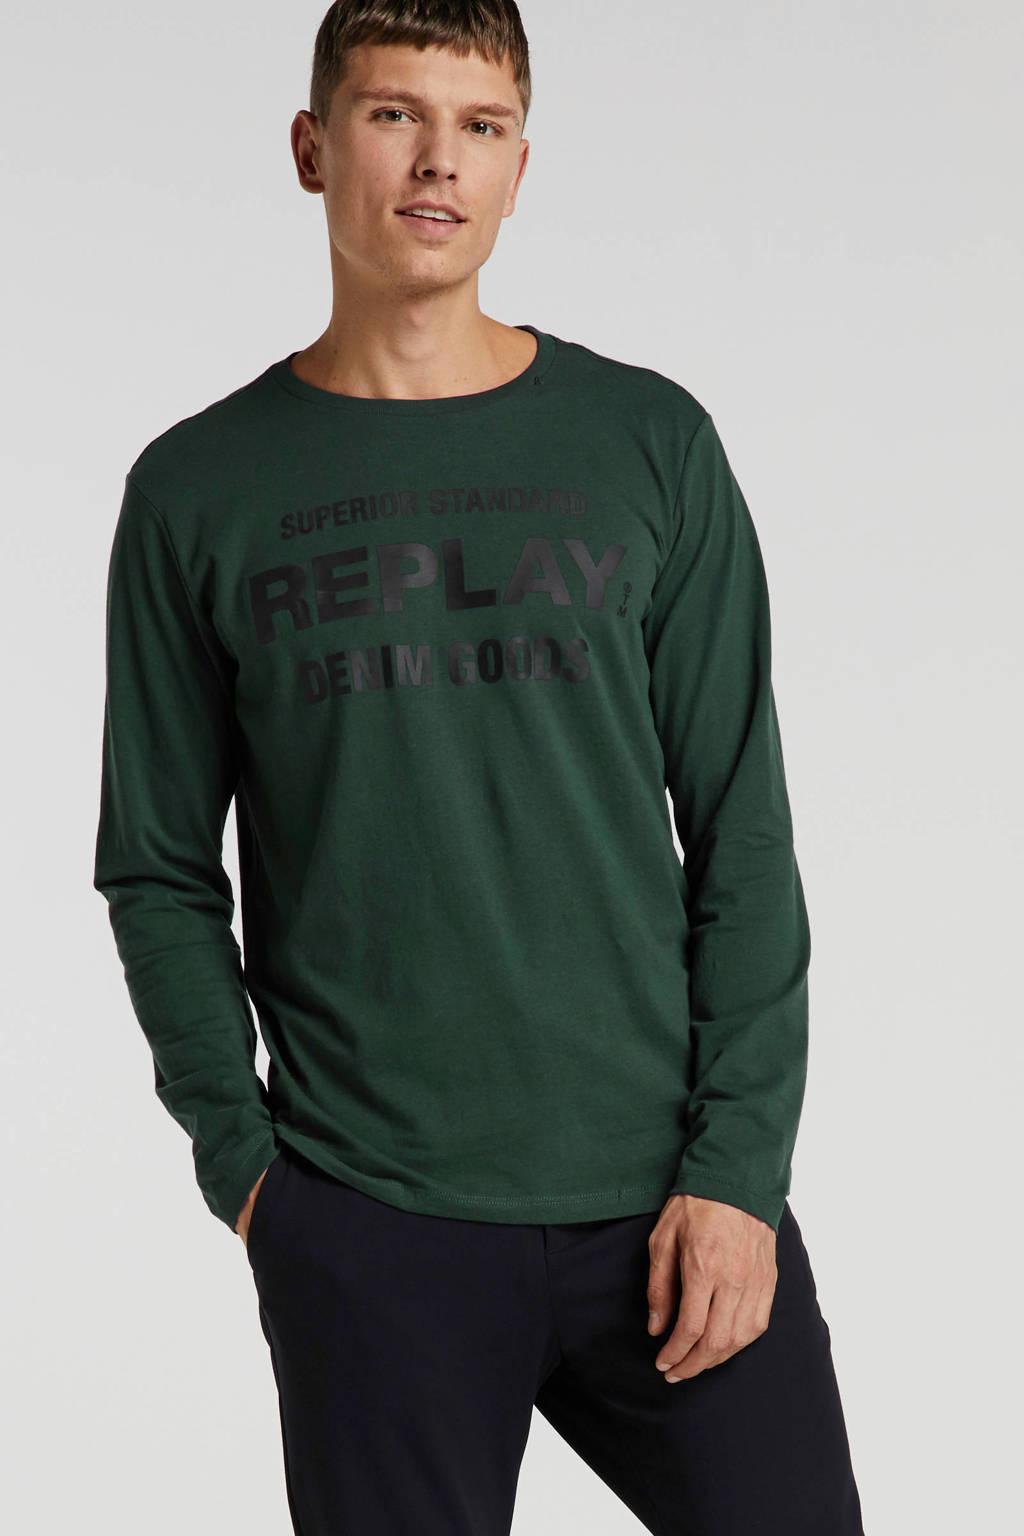 REPLAY T-shirt met printopdruk donkergroen, Donkergroen